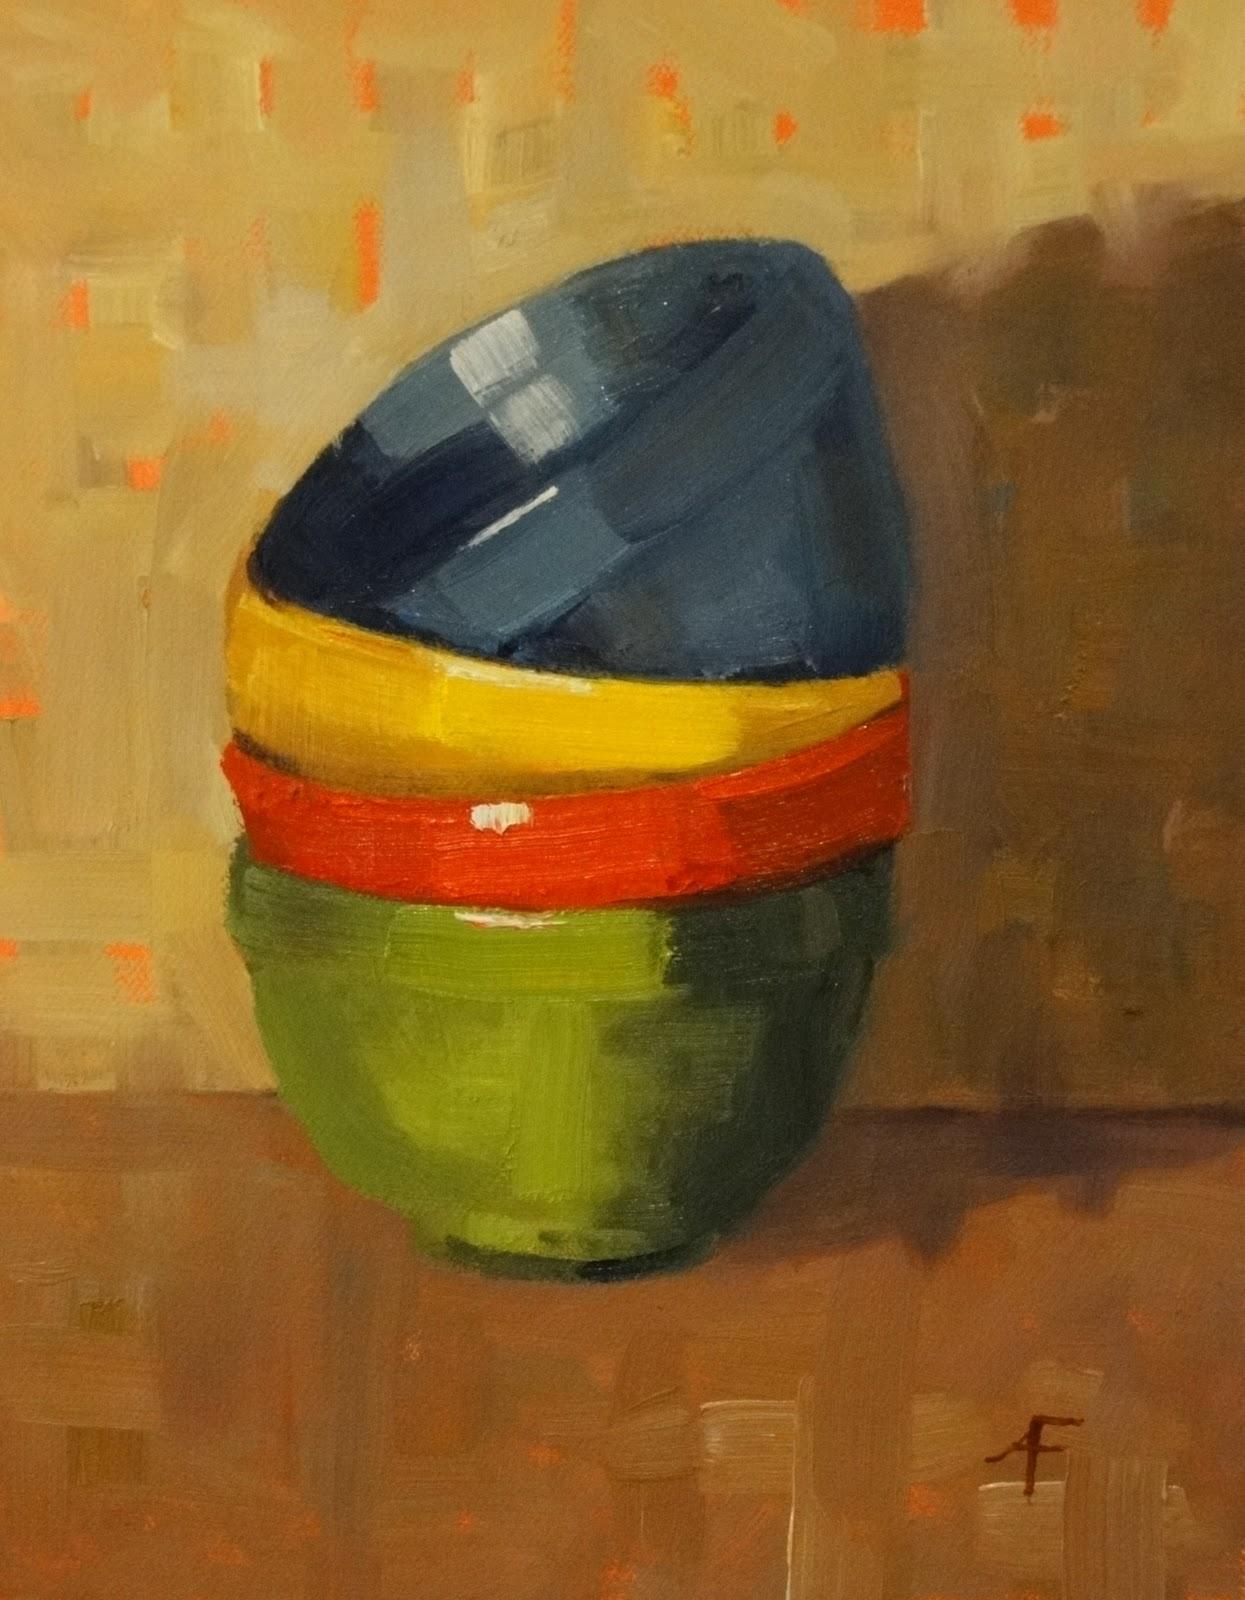 """Nesting Time Again, 8x10 (Sold)"" original fine art by Ann Feldman"